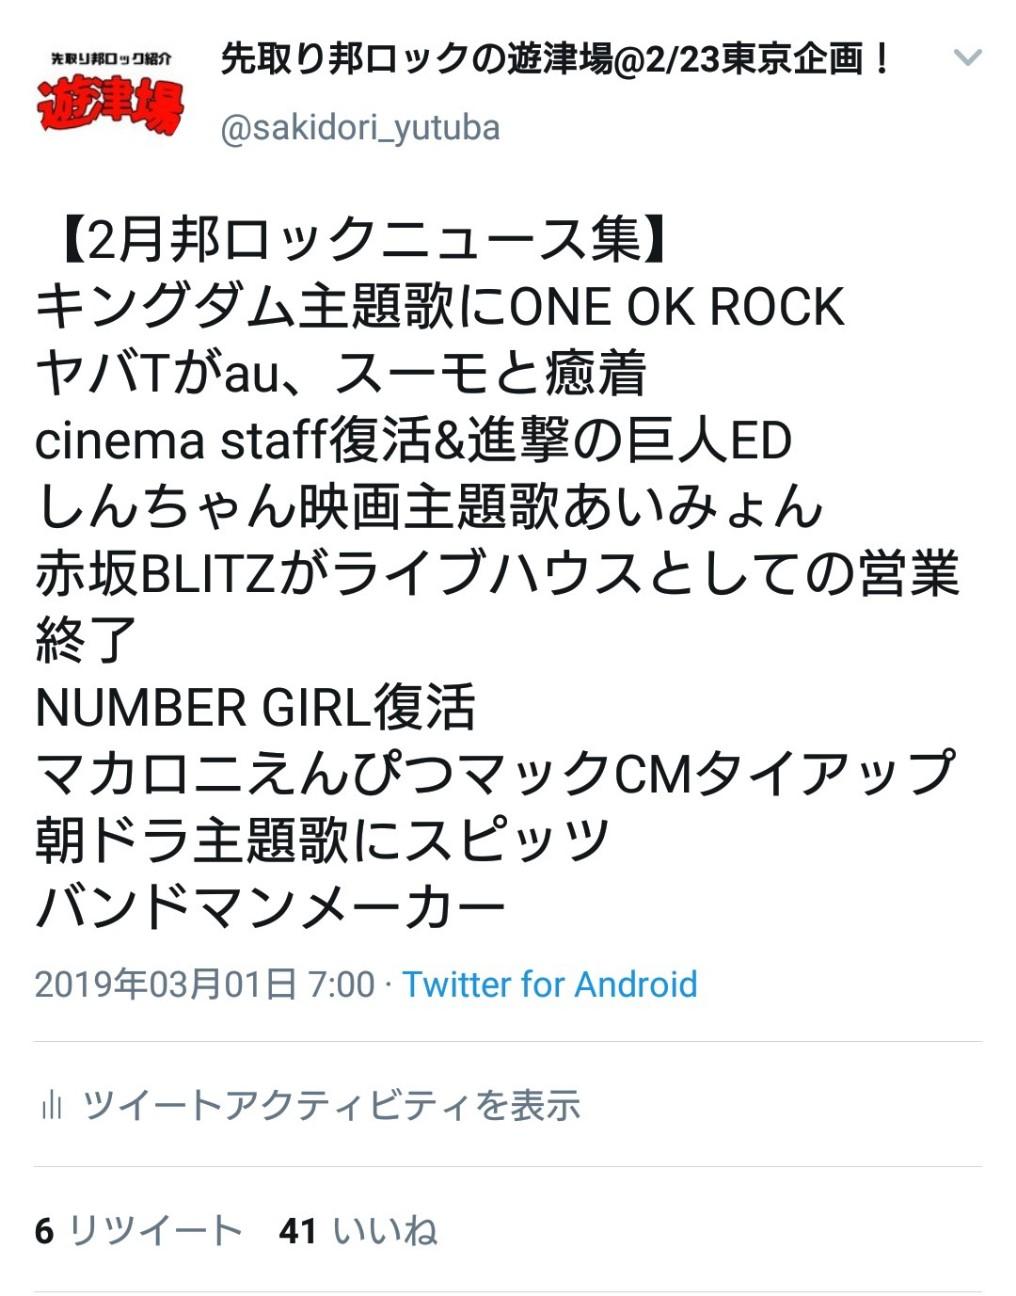 f:id:sakidoriyutsubarock:20191218003456j:plain